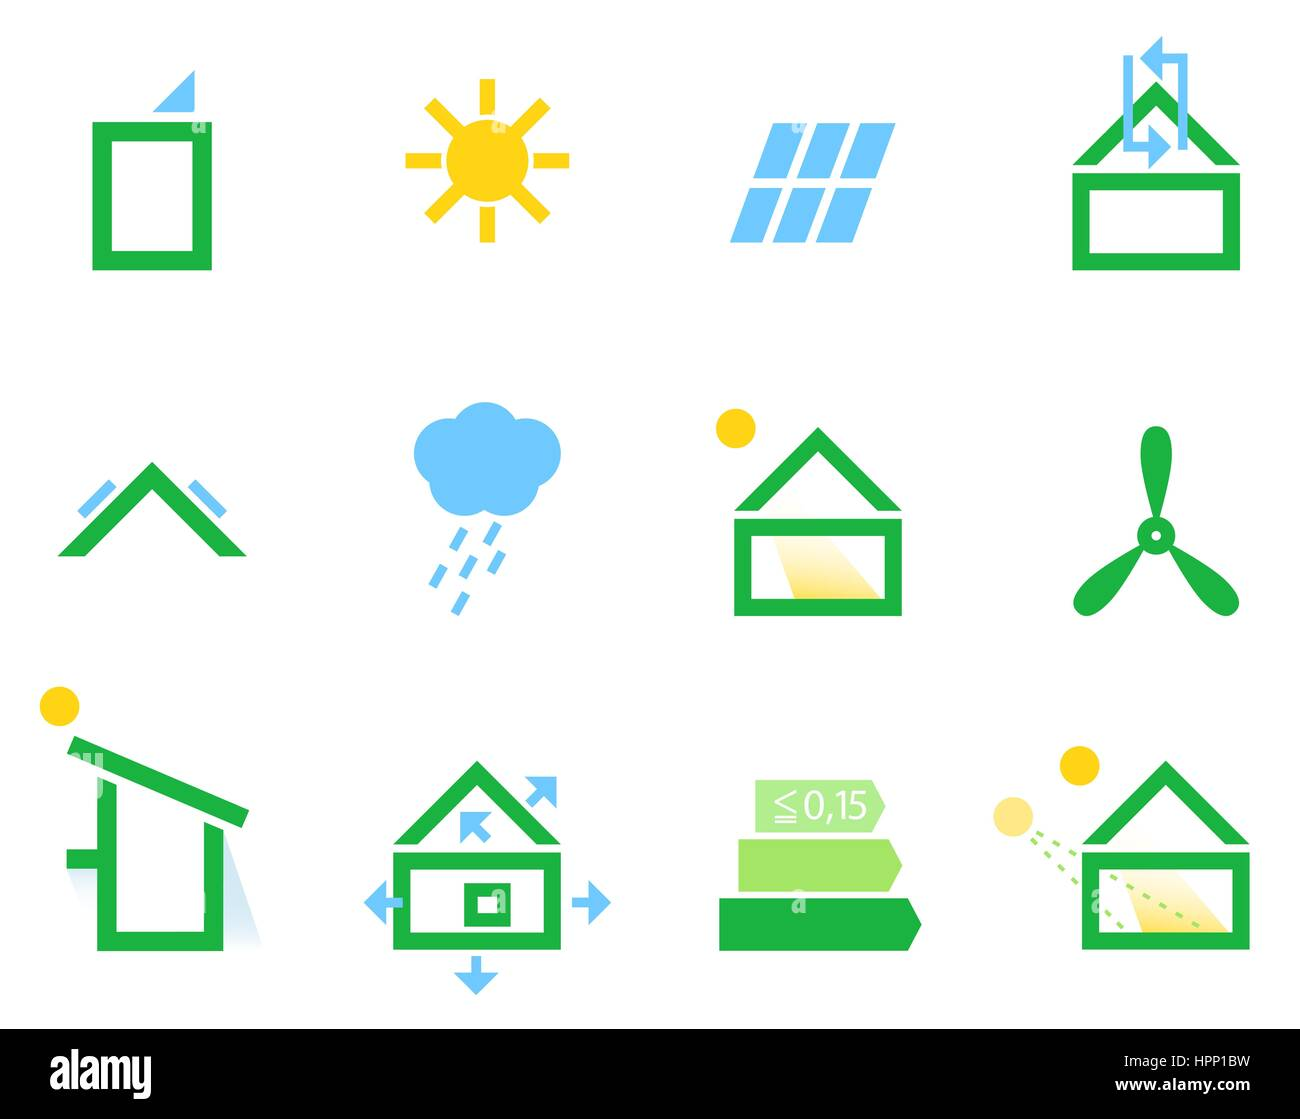 20295628 - energieeffiziente Häuser Symbole.  Abbildung Stockbild